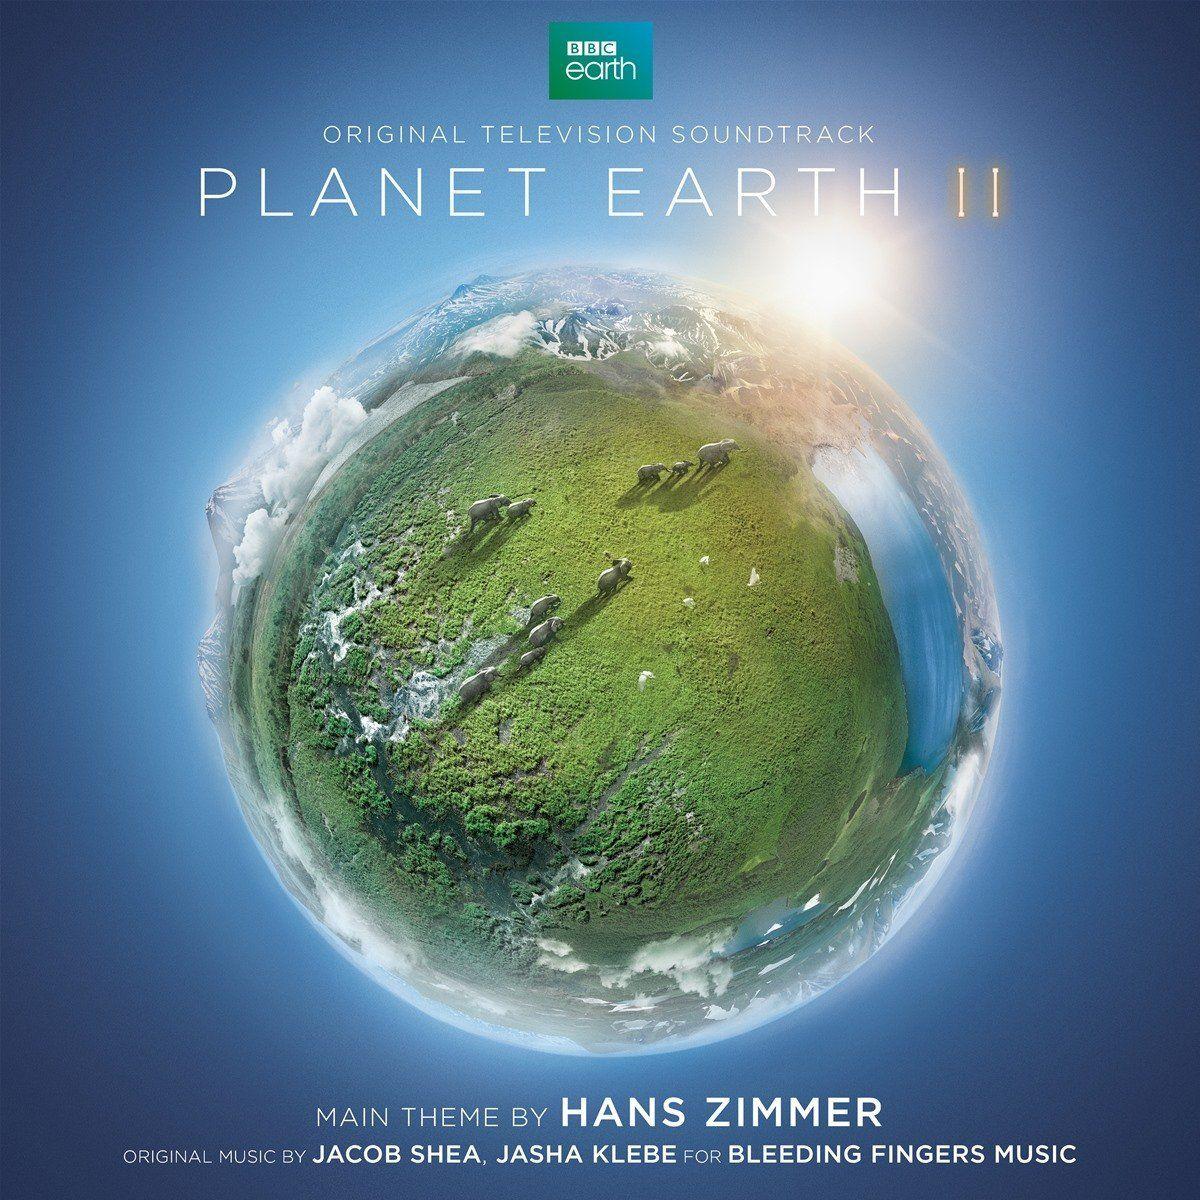 Google themes earth - Planet Earth Ii Soundtrack Google Search